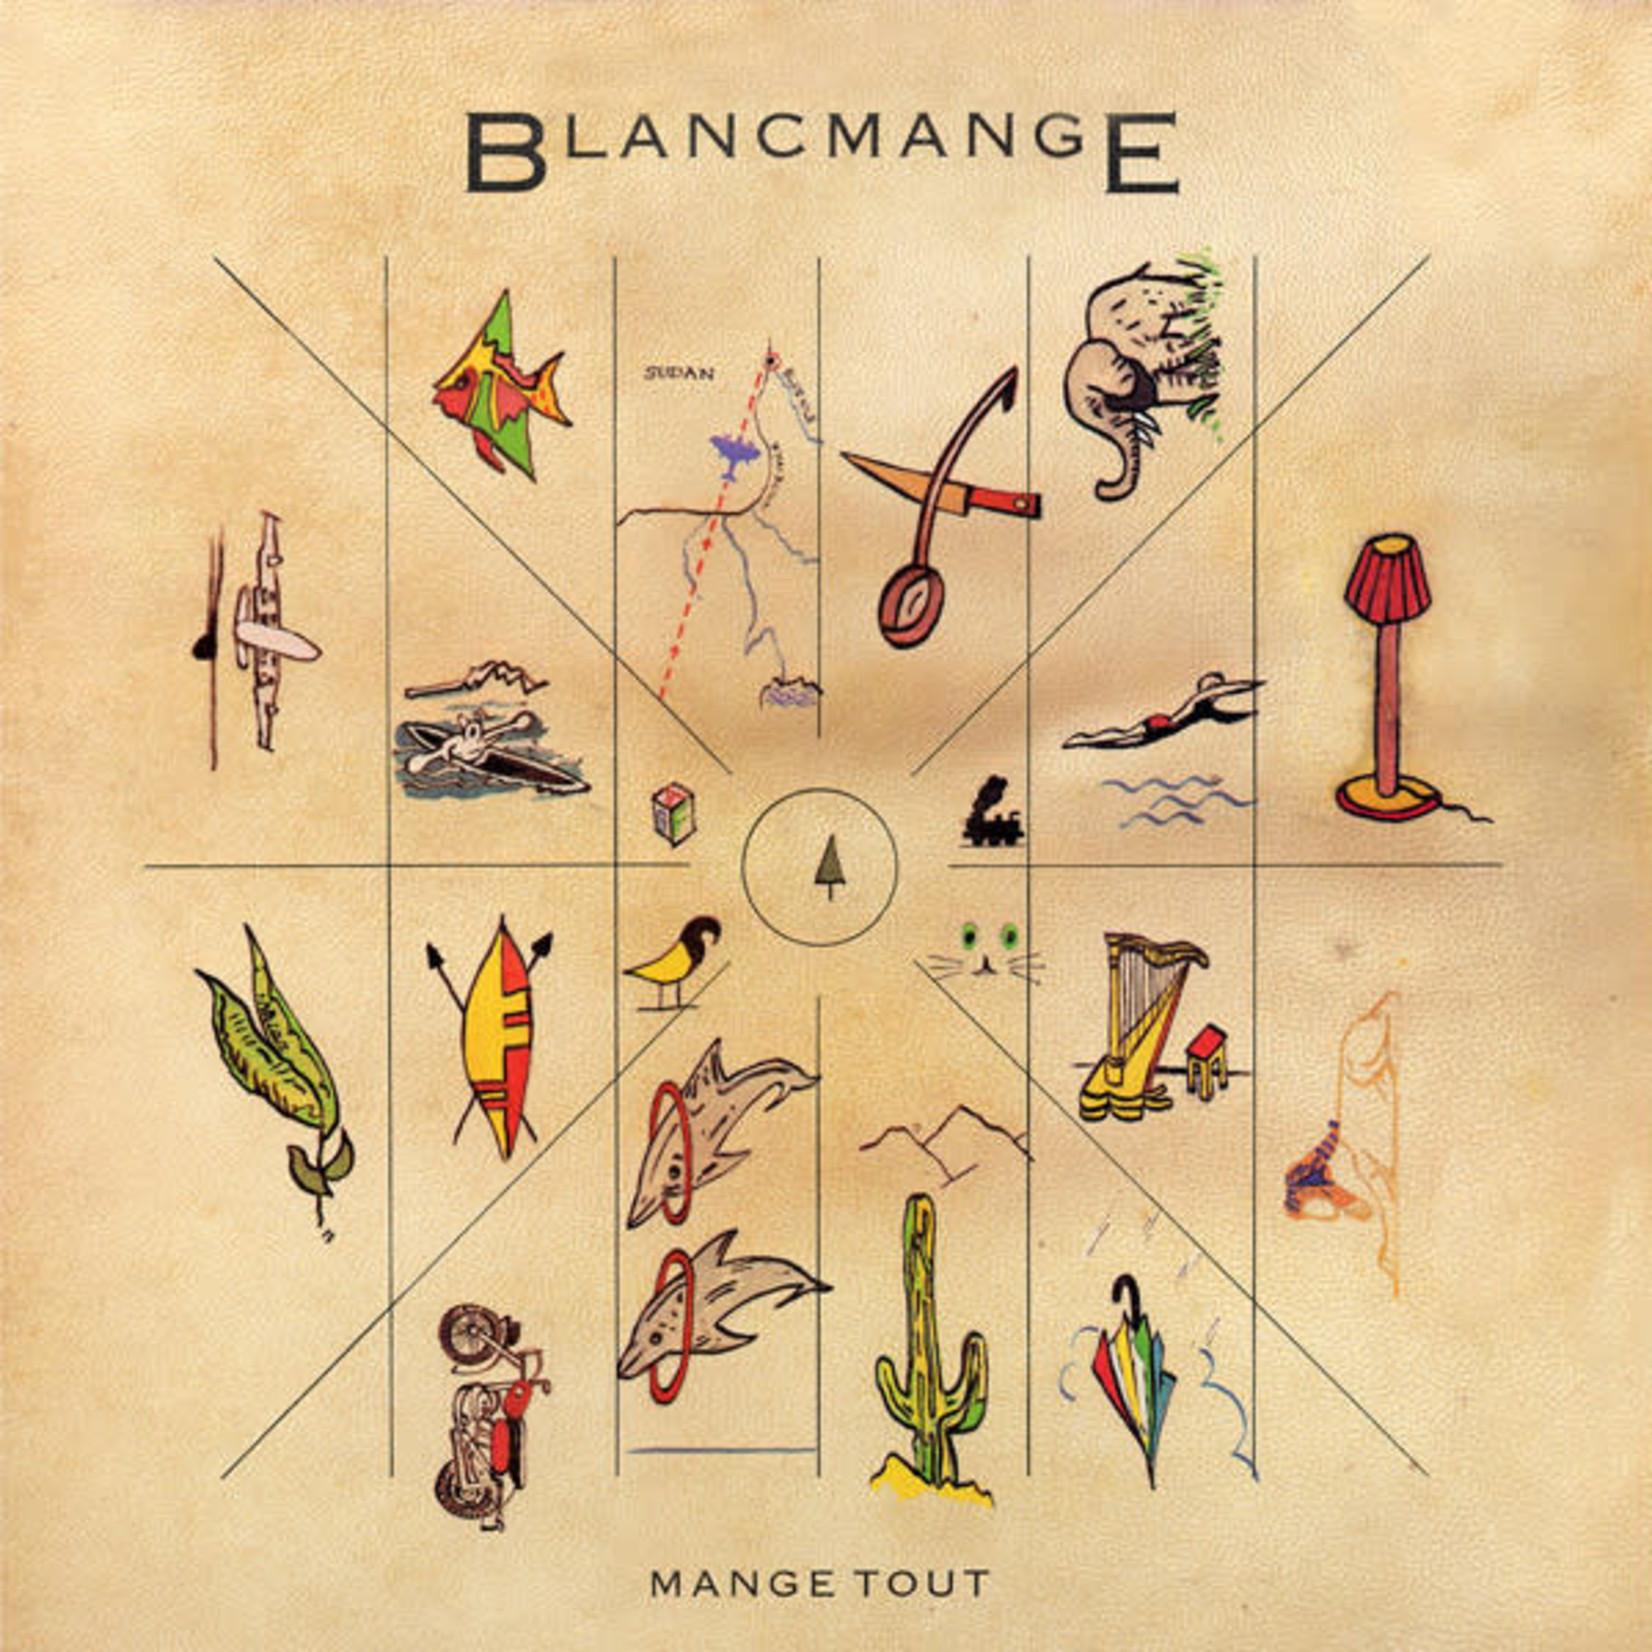 [Vintage] Blancmange: Mange Tout